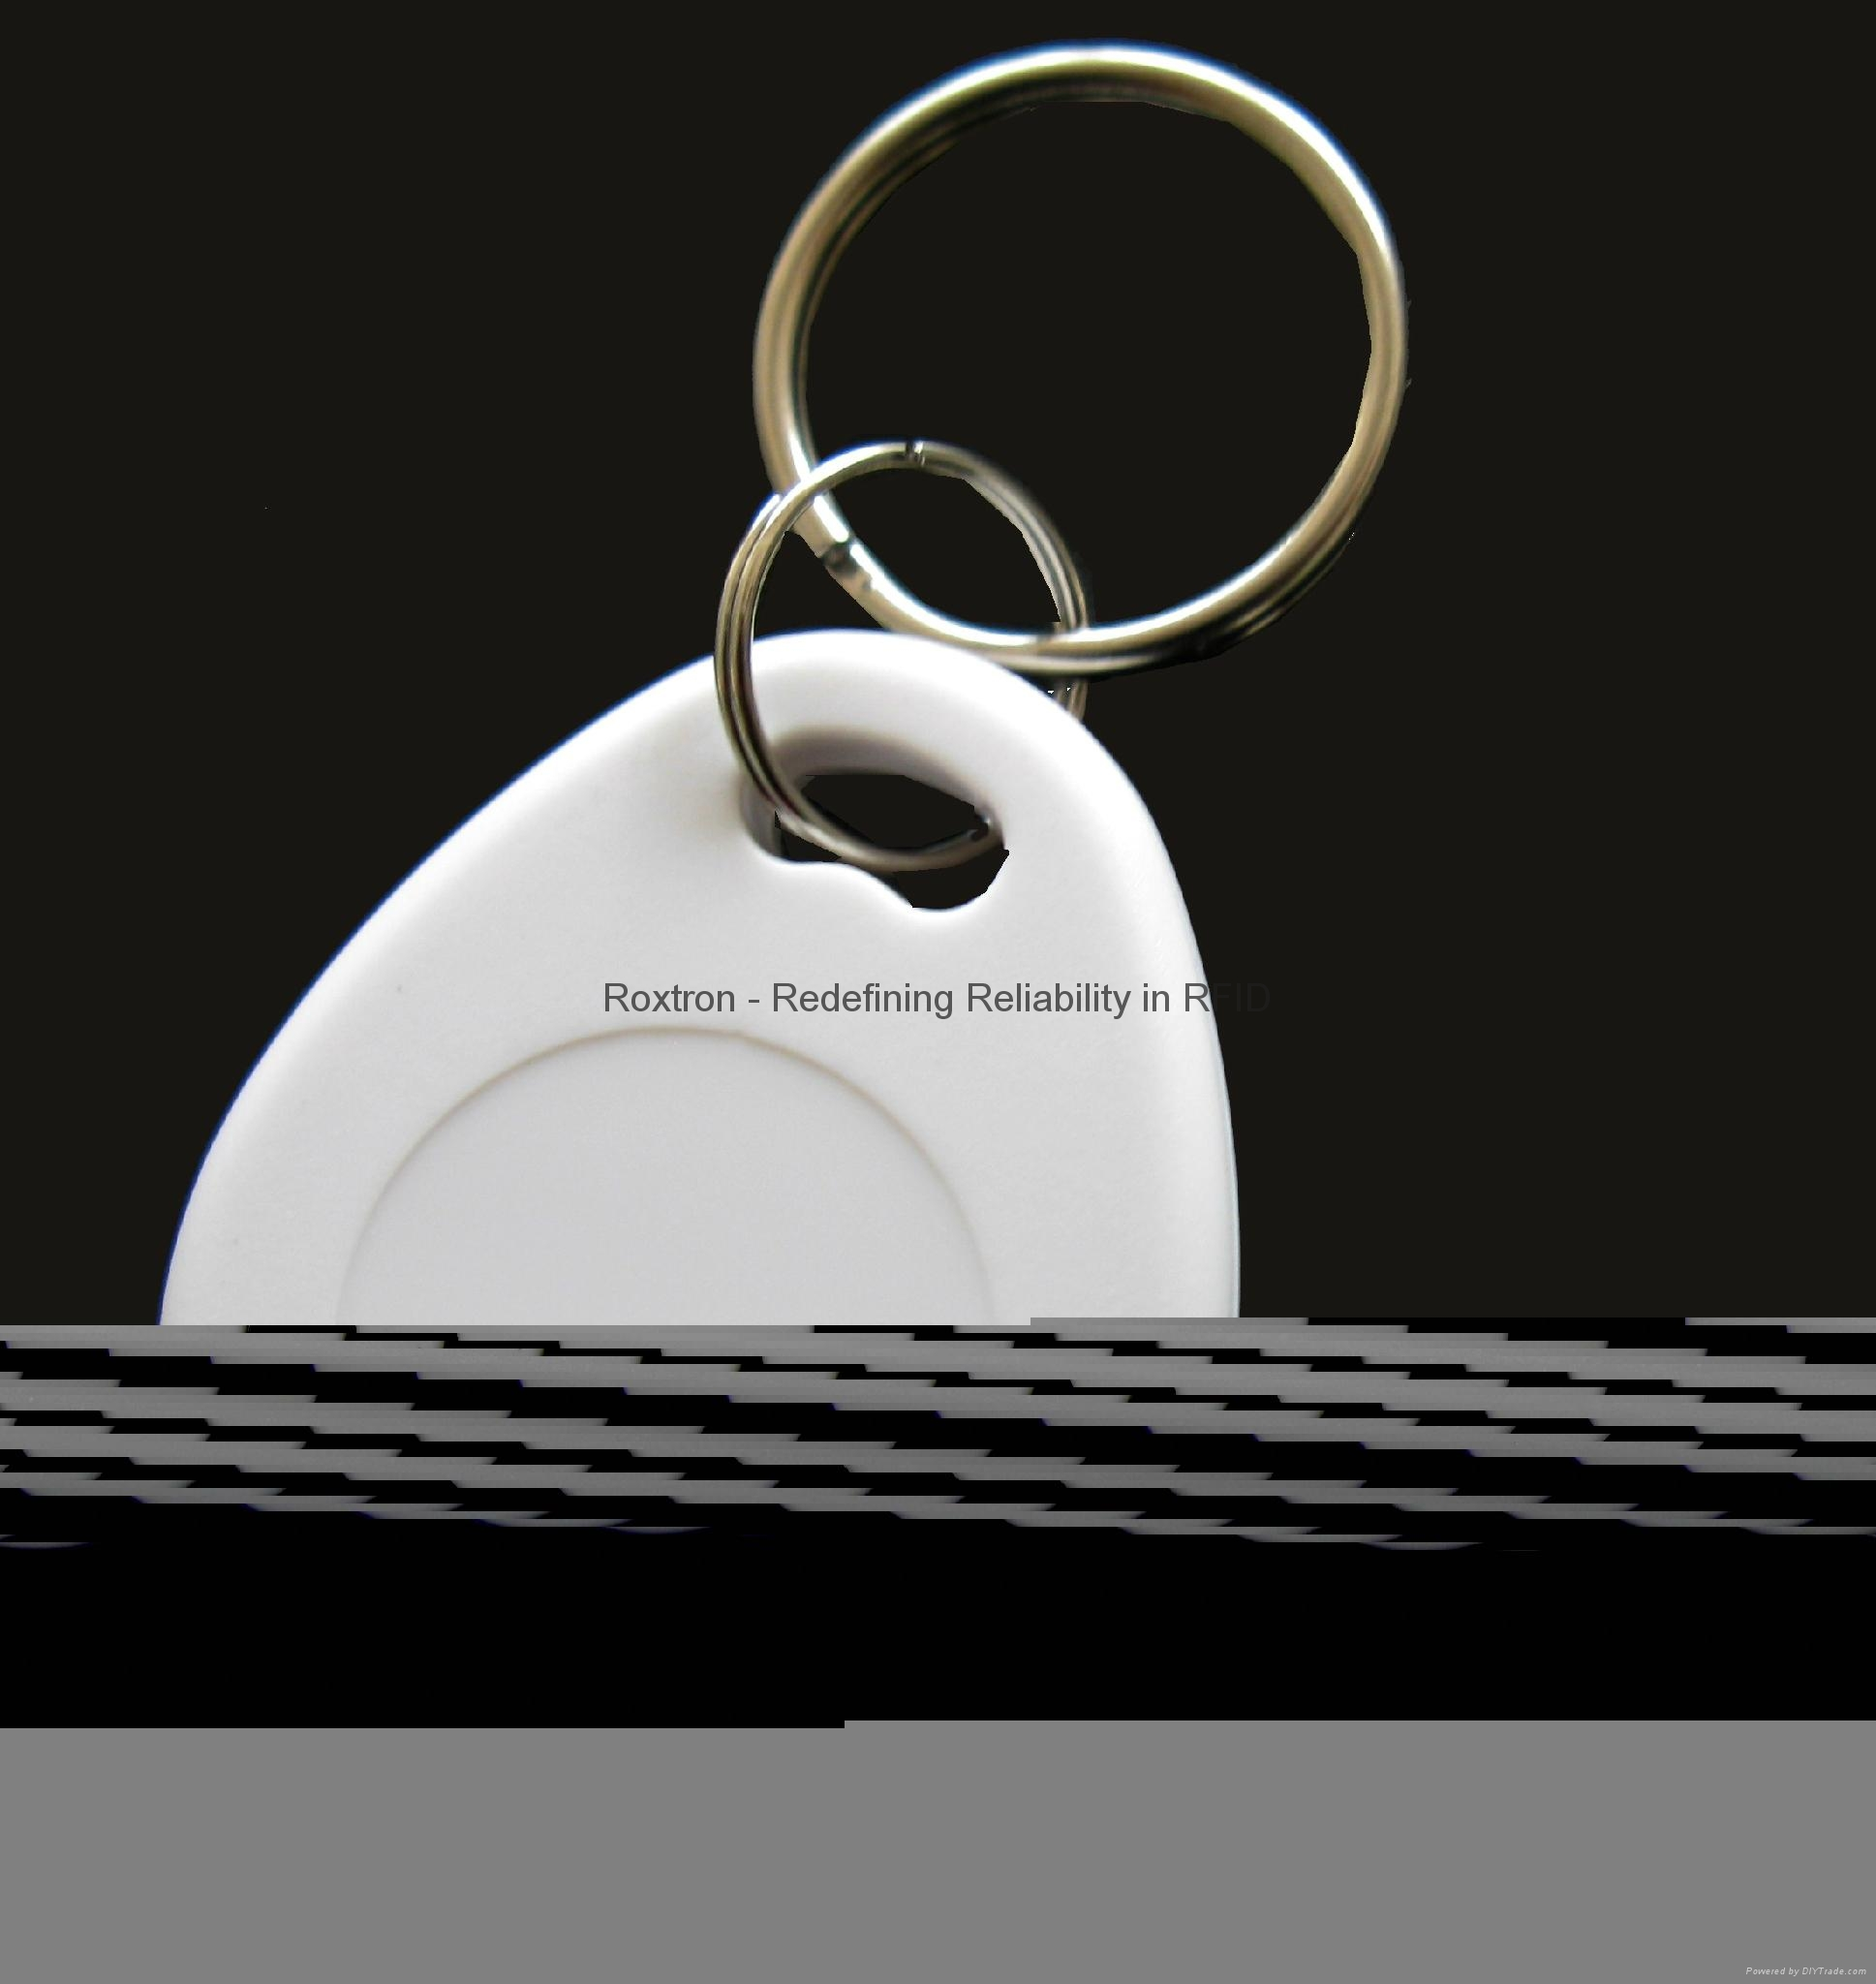 ROXTRON MIFARE 4K RXK03 Key Fob